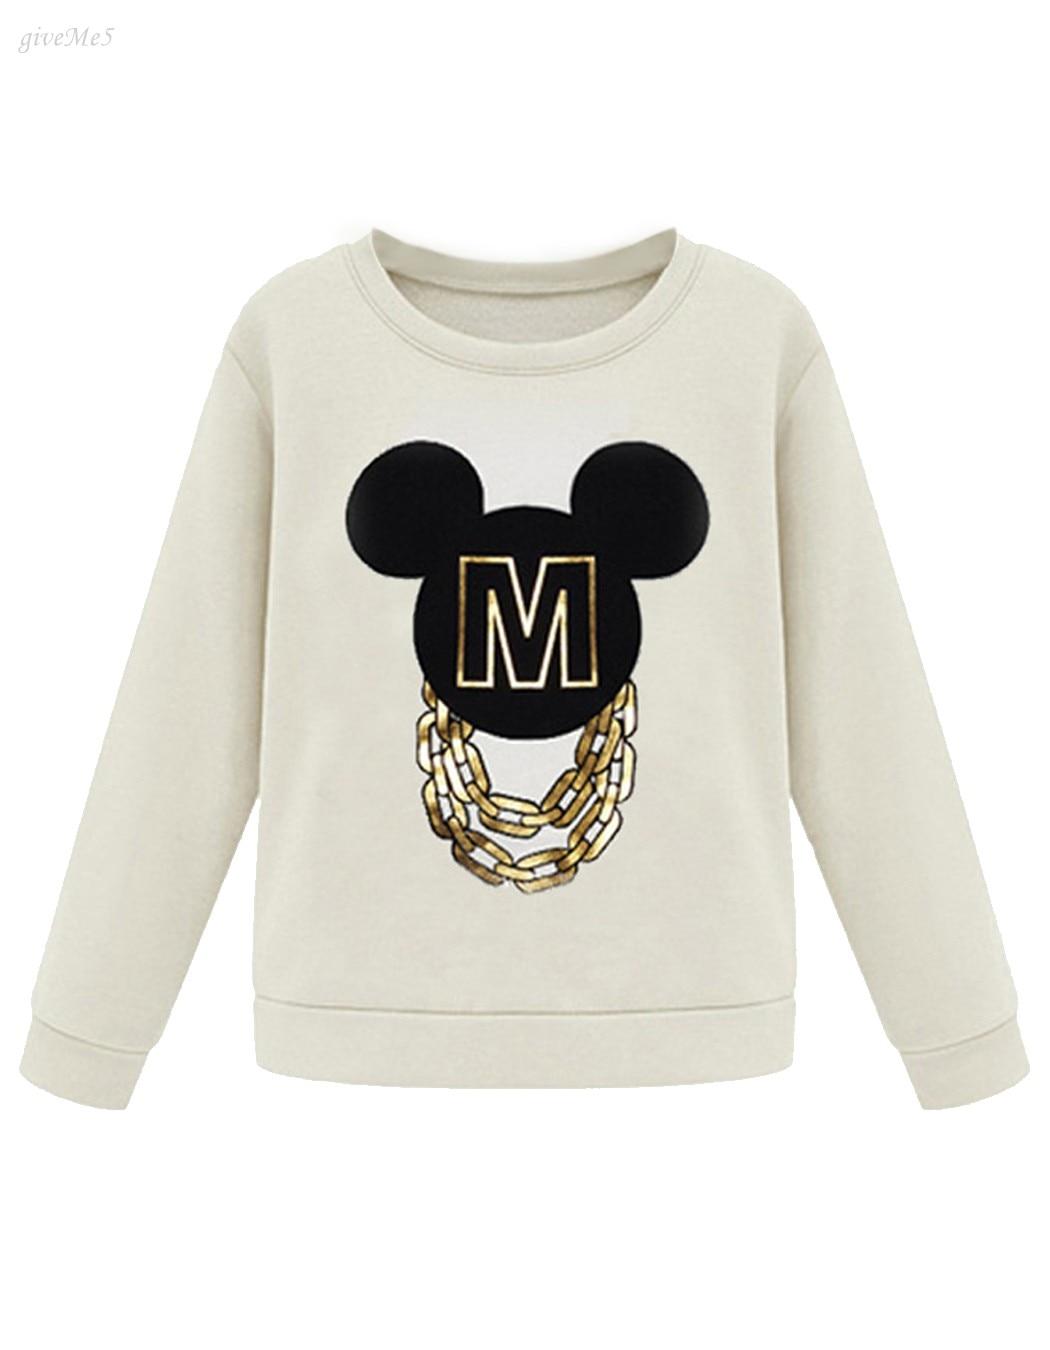 Women Cartoon Design Printing Pullover O-neck Loose Long Sleeve Hoodies Shirt Tops Hoodie Sweatershirts 34